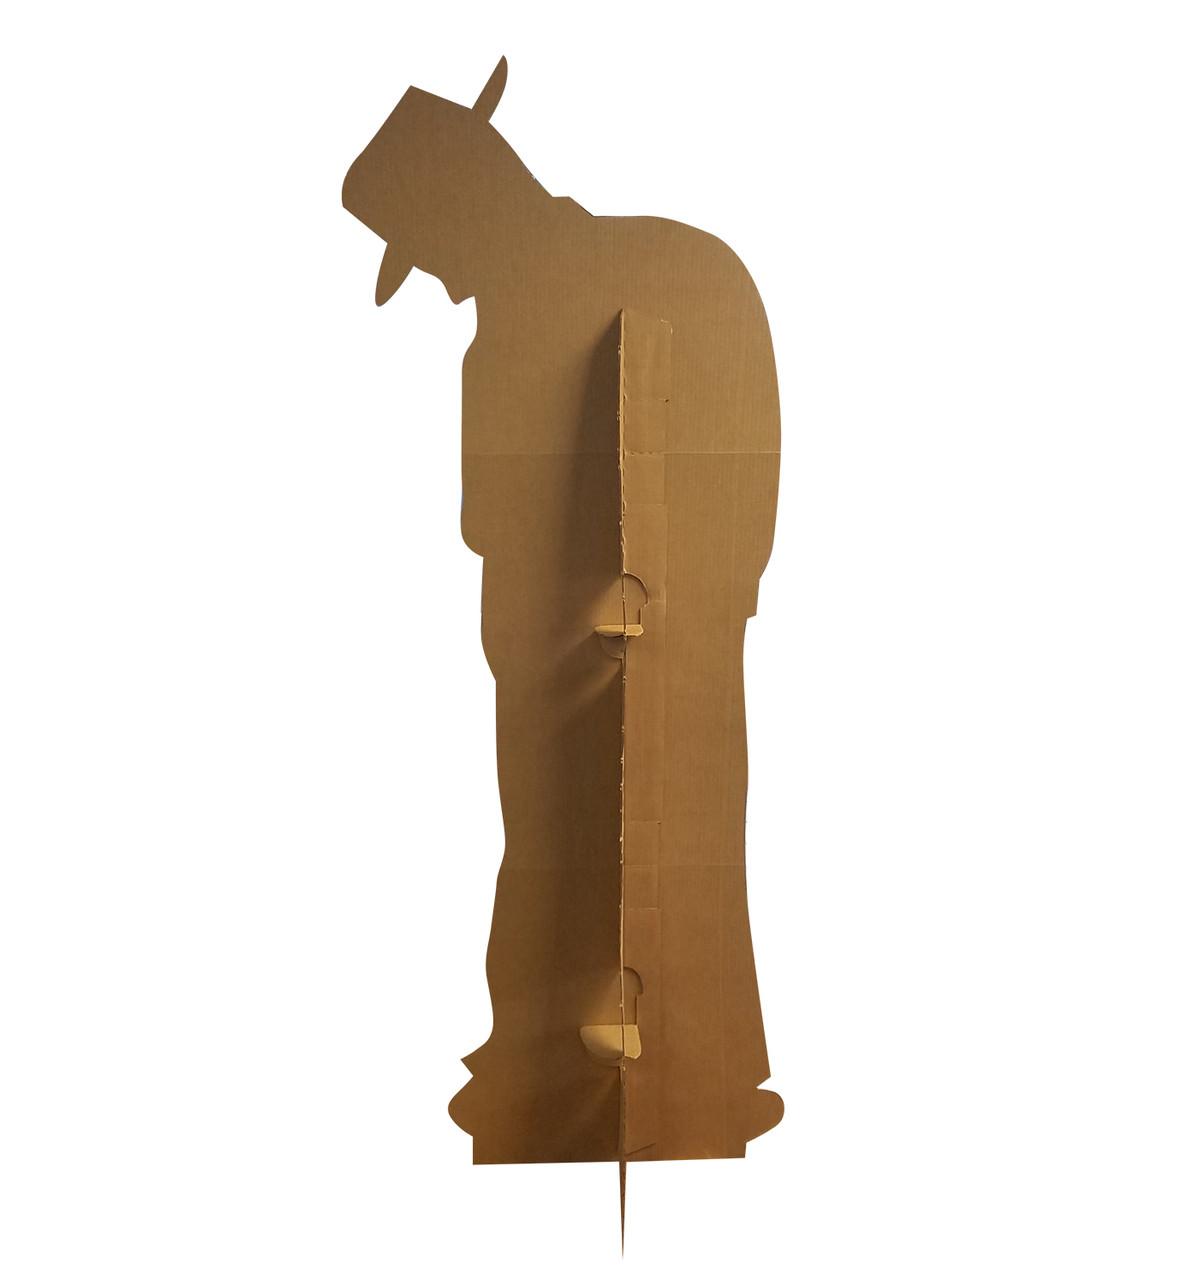 Life-size Gangster Silhouette Cardboard Standup | Cardboard Cutout